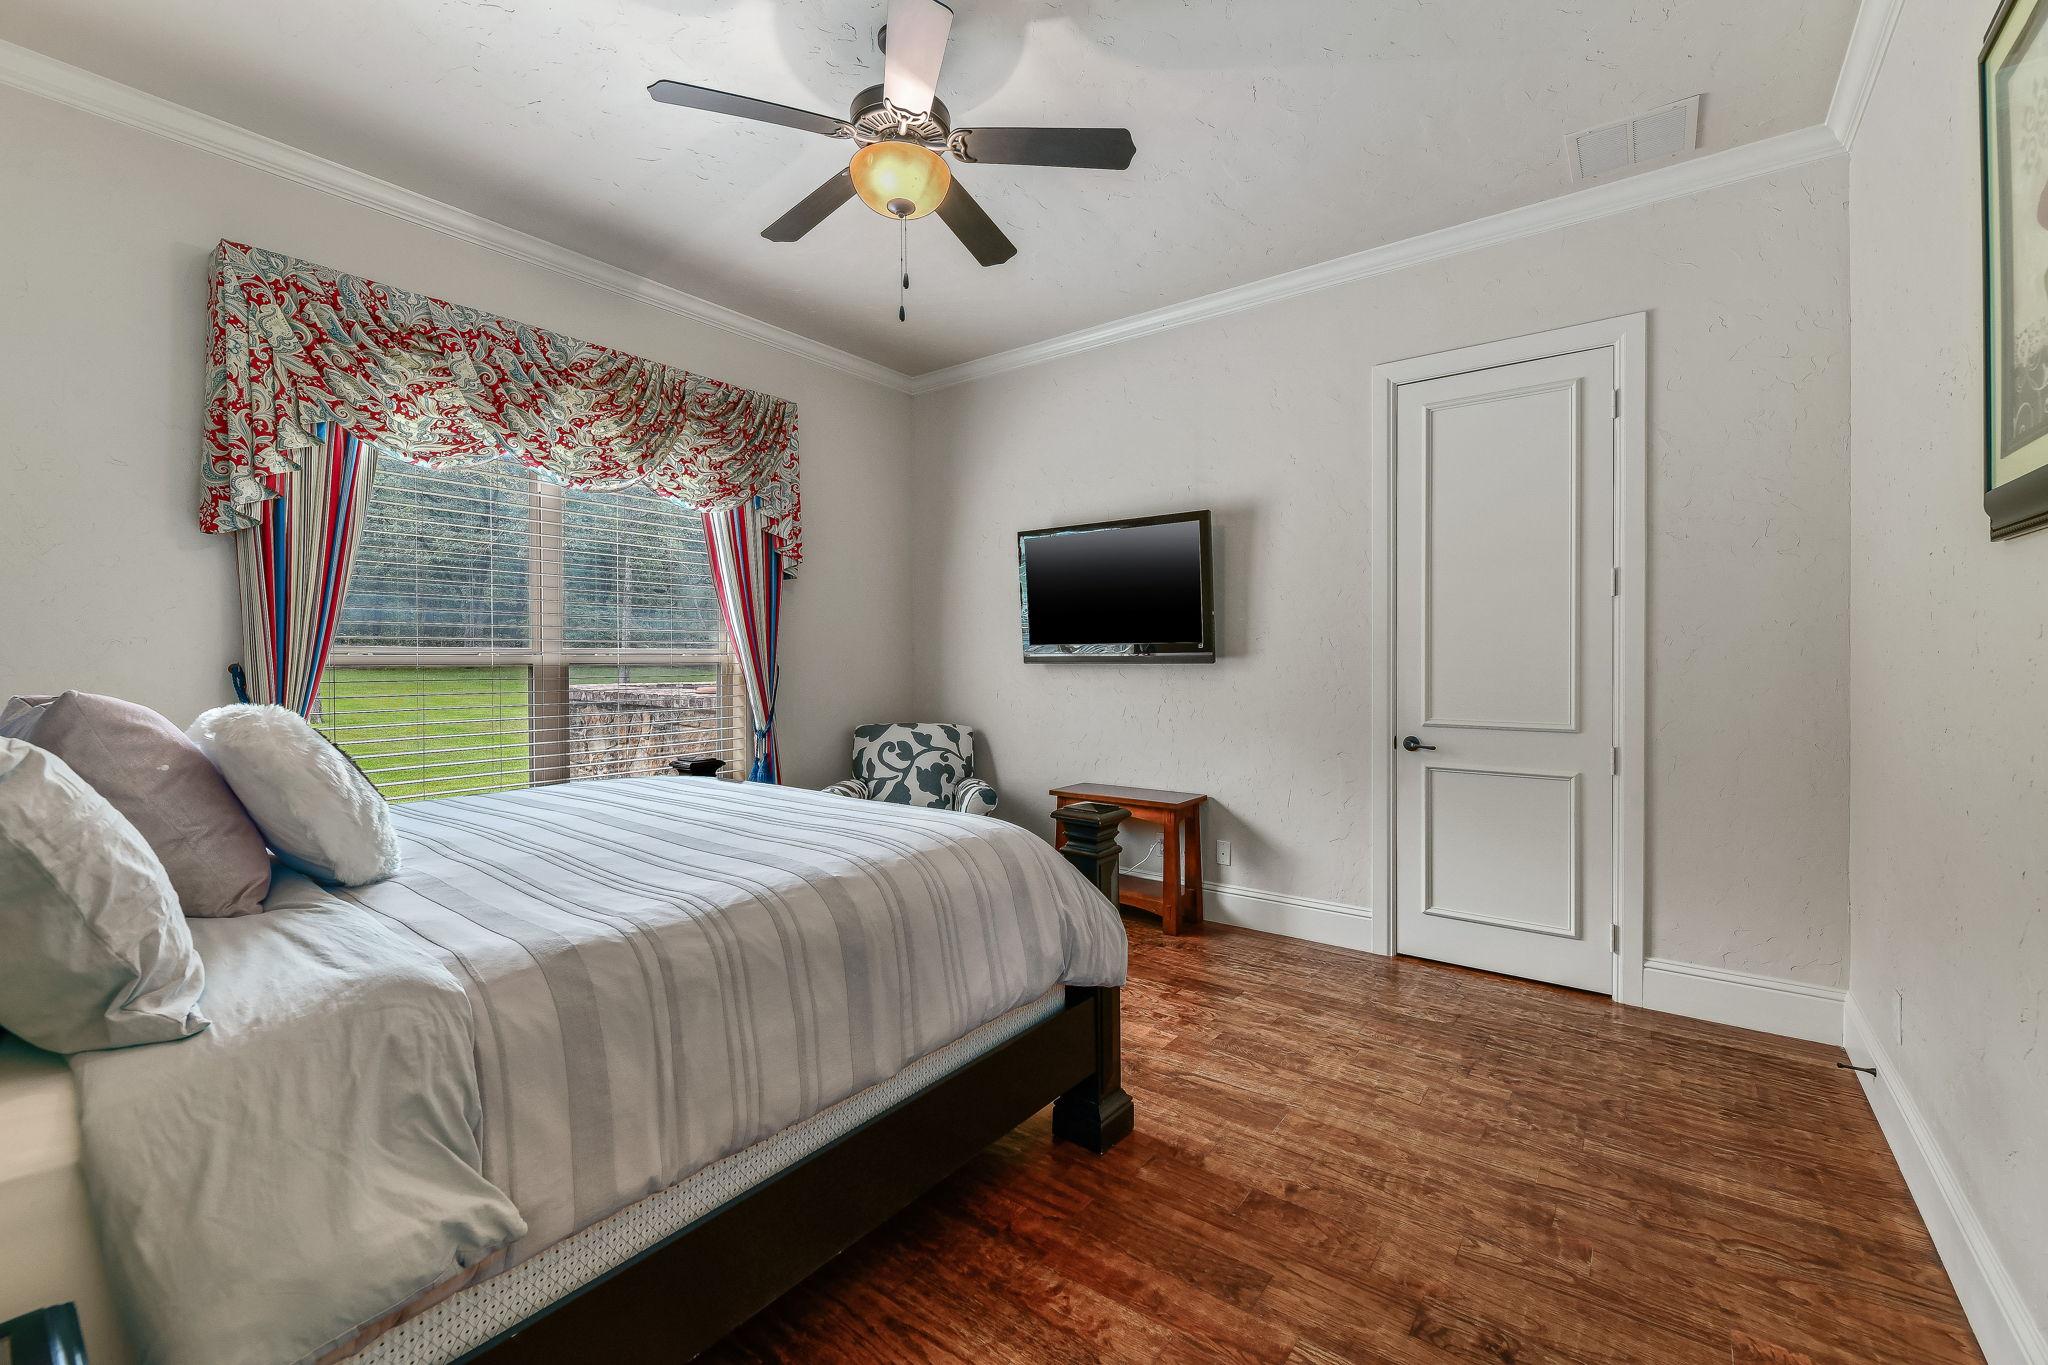 028-Bedroom 2-FULL